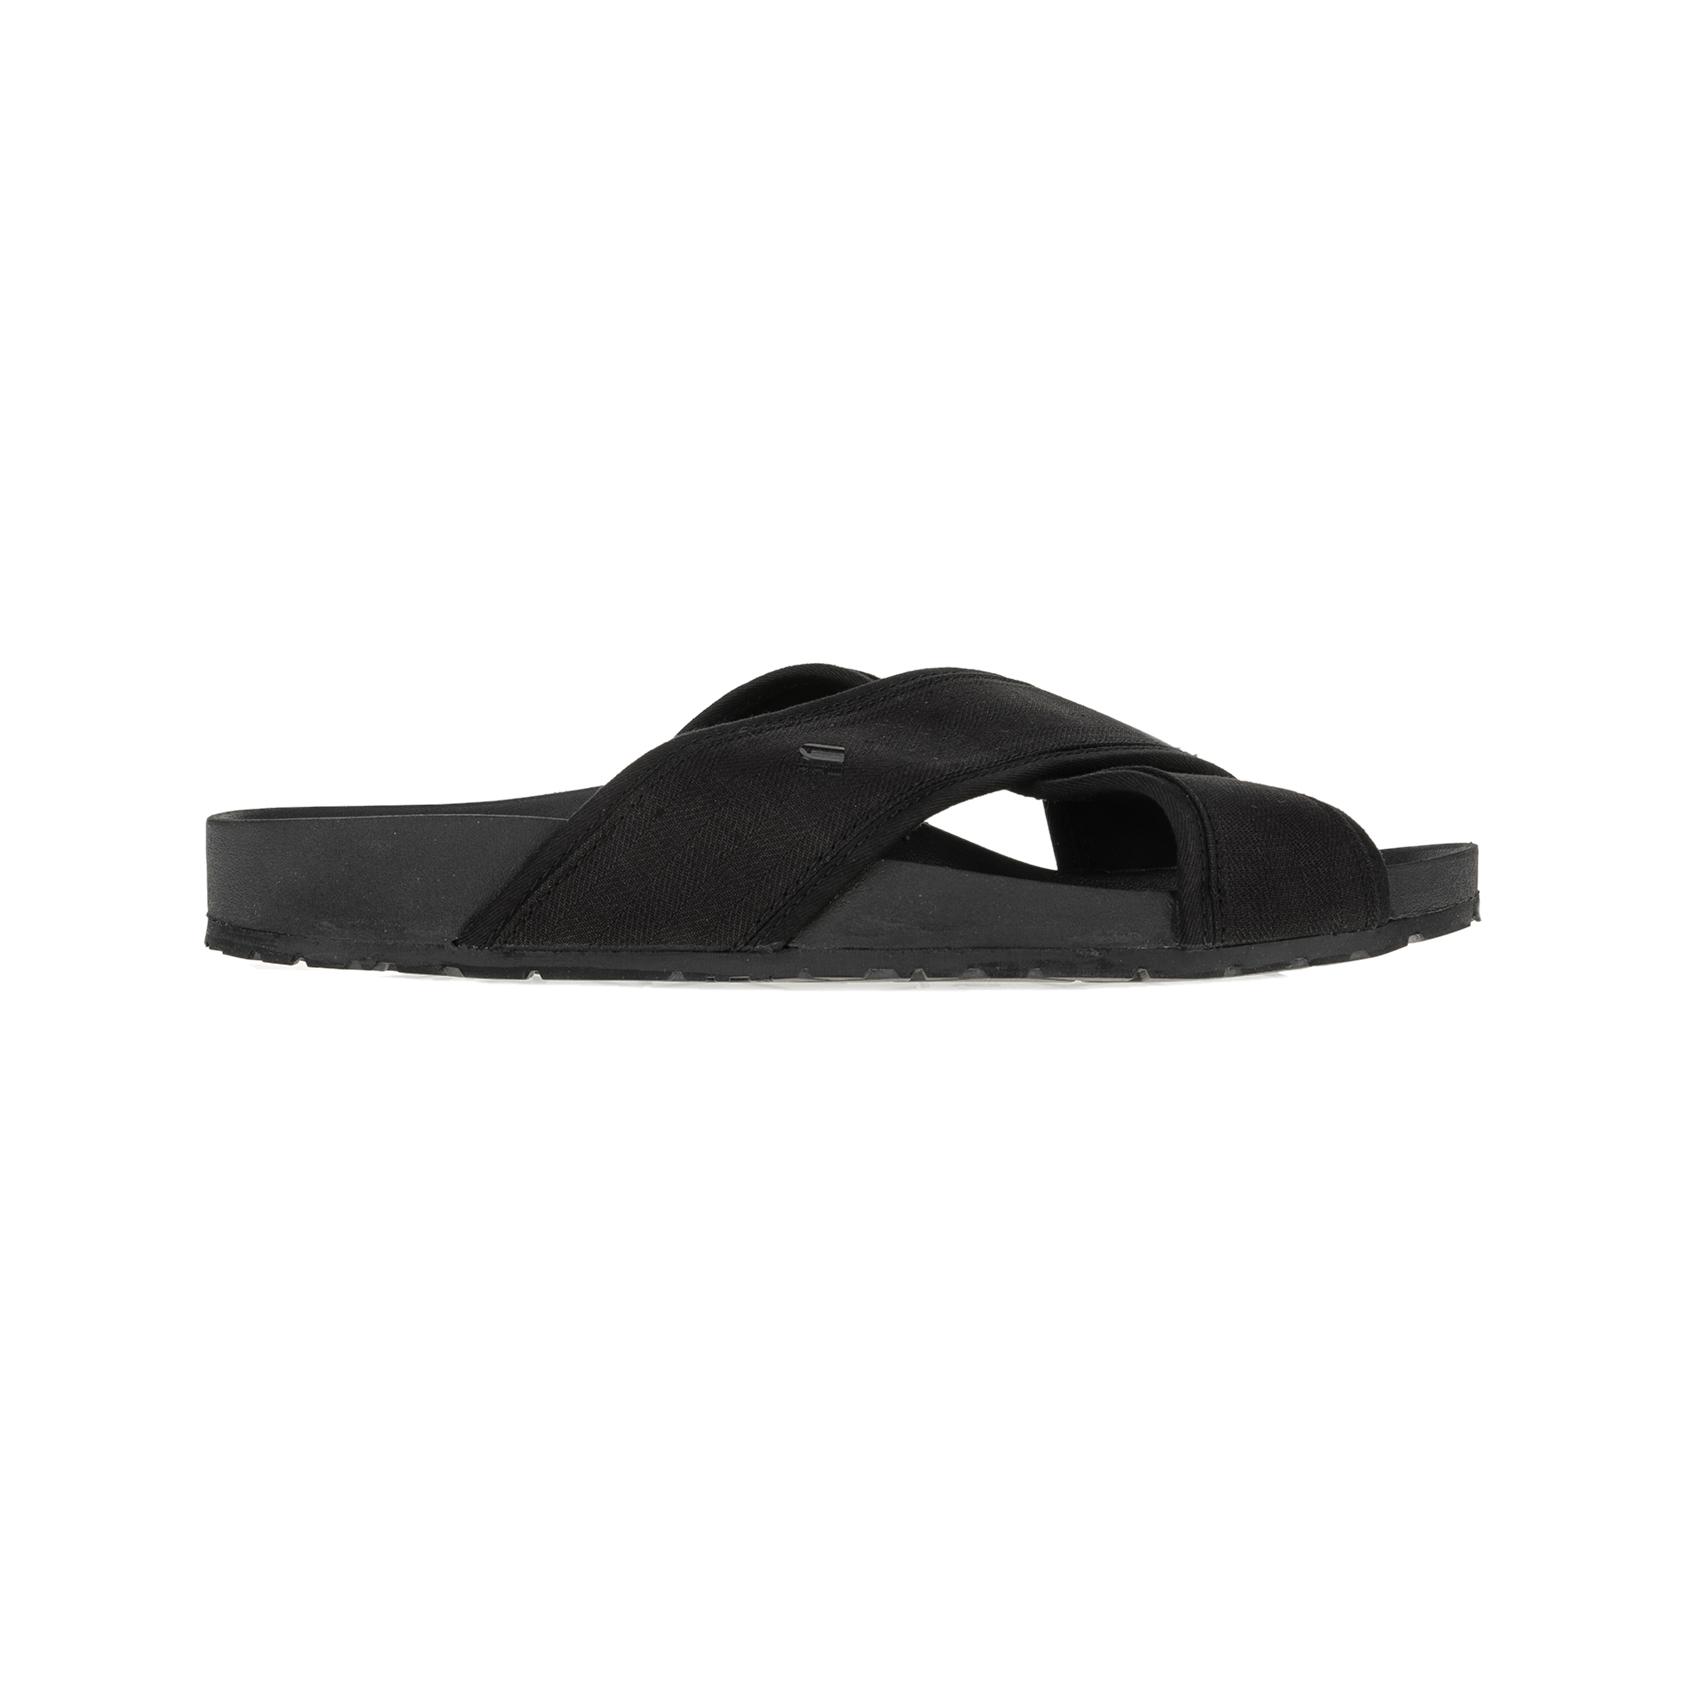 G-STAR RAW - Ανδρικές παντόφλες G-STAR NETROL STRAP μαύρες ανδρικά παπούτσια παντόφλες